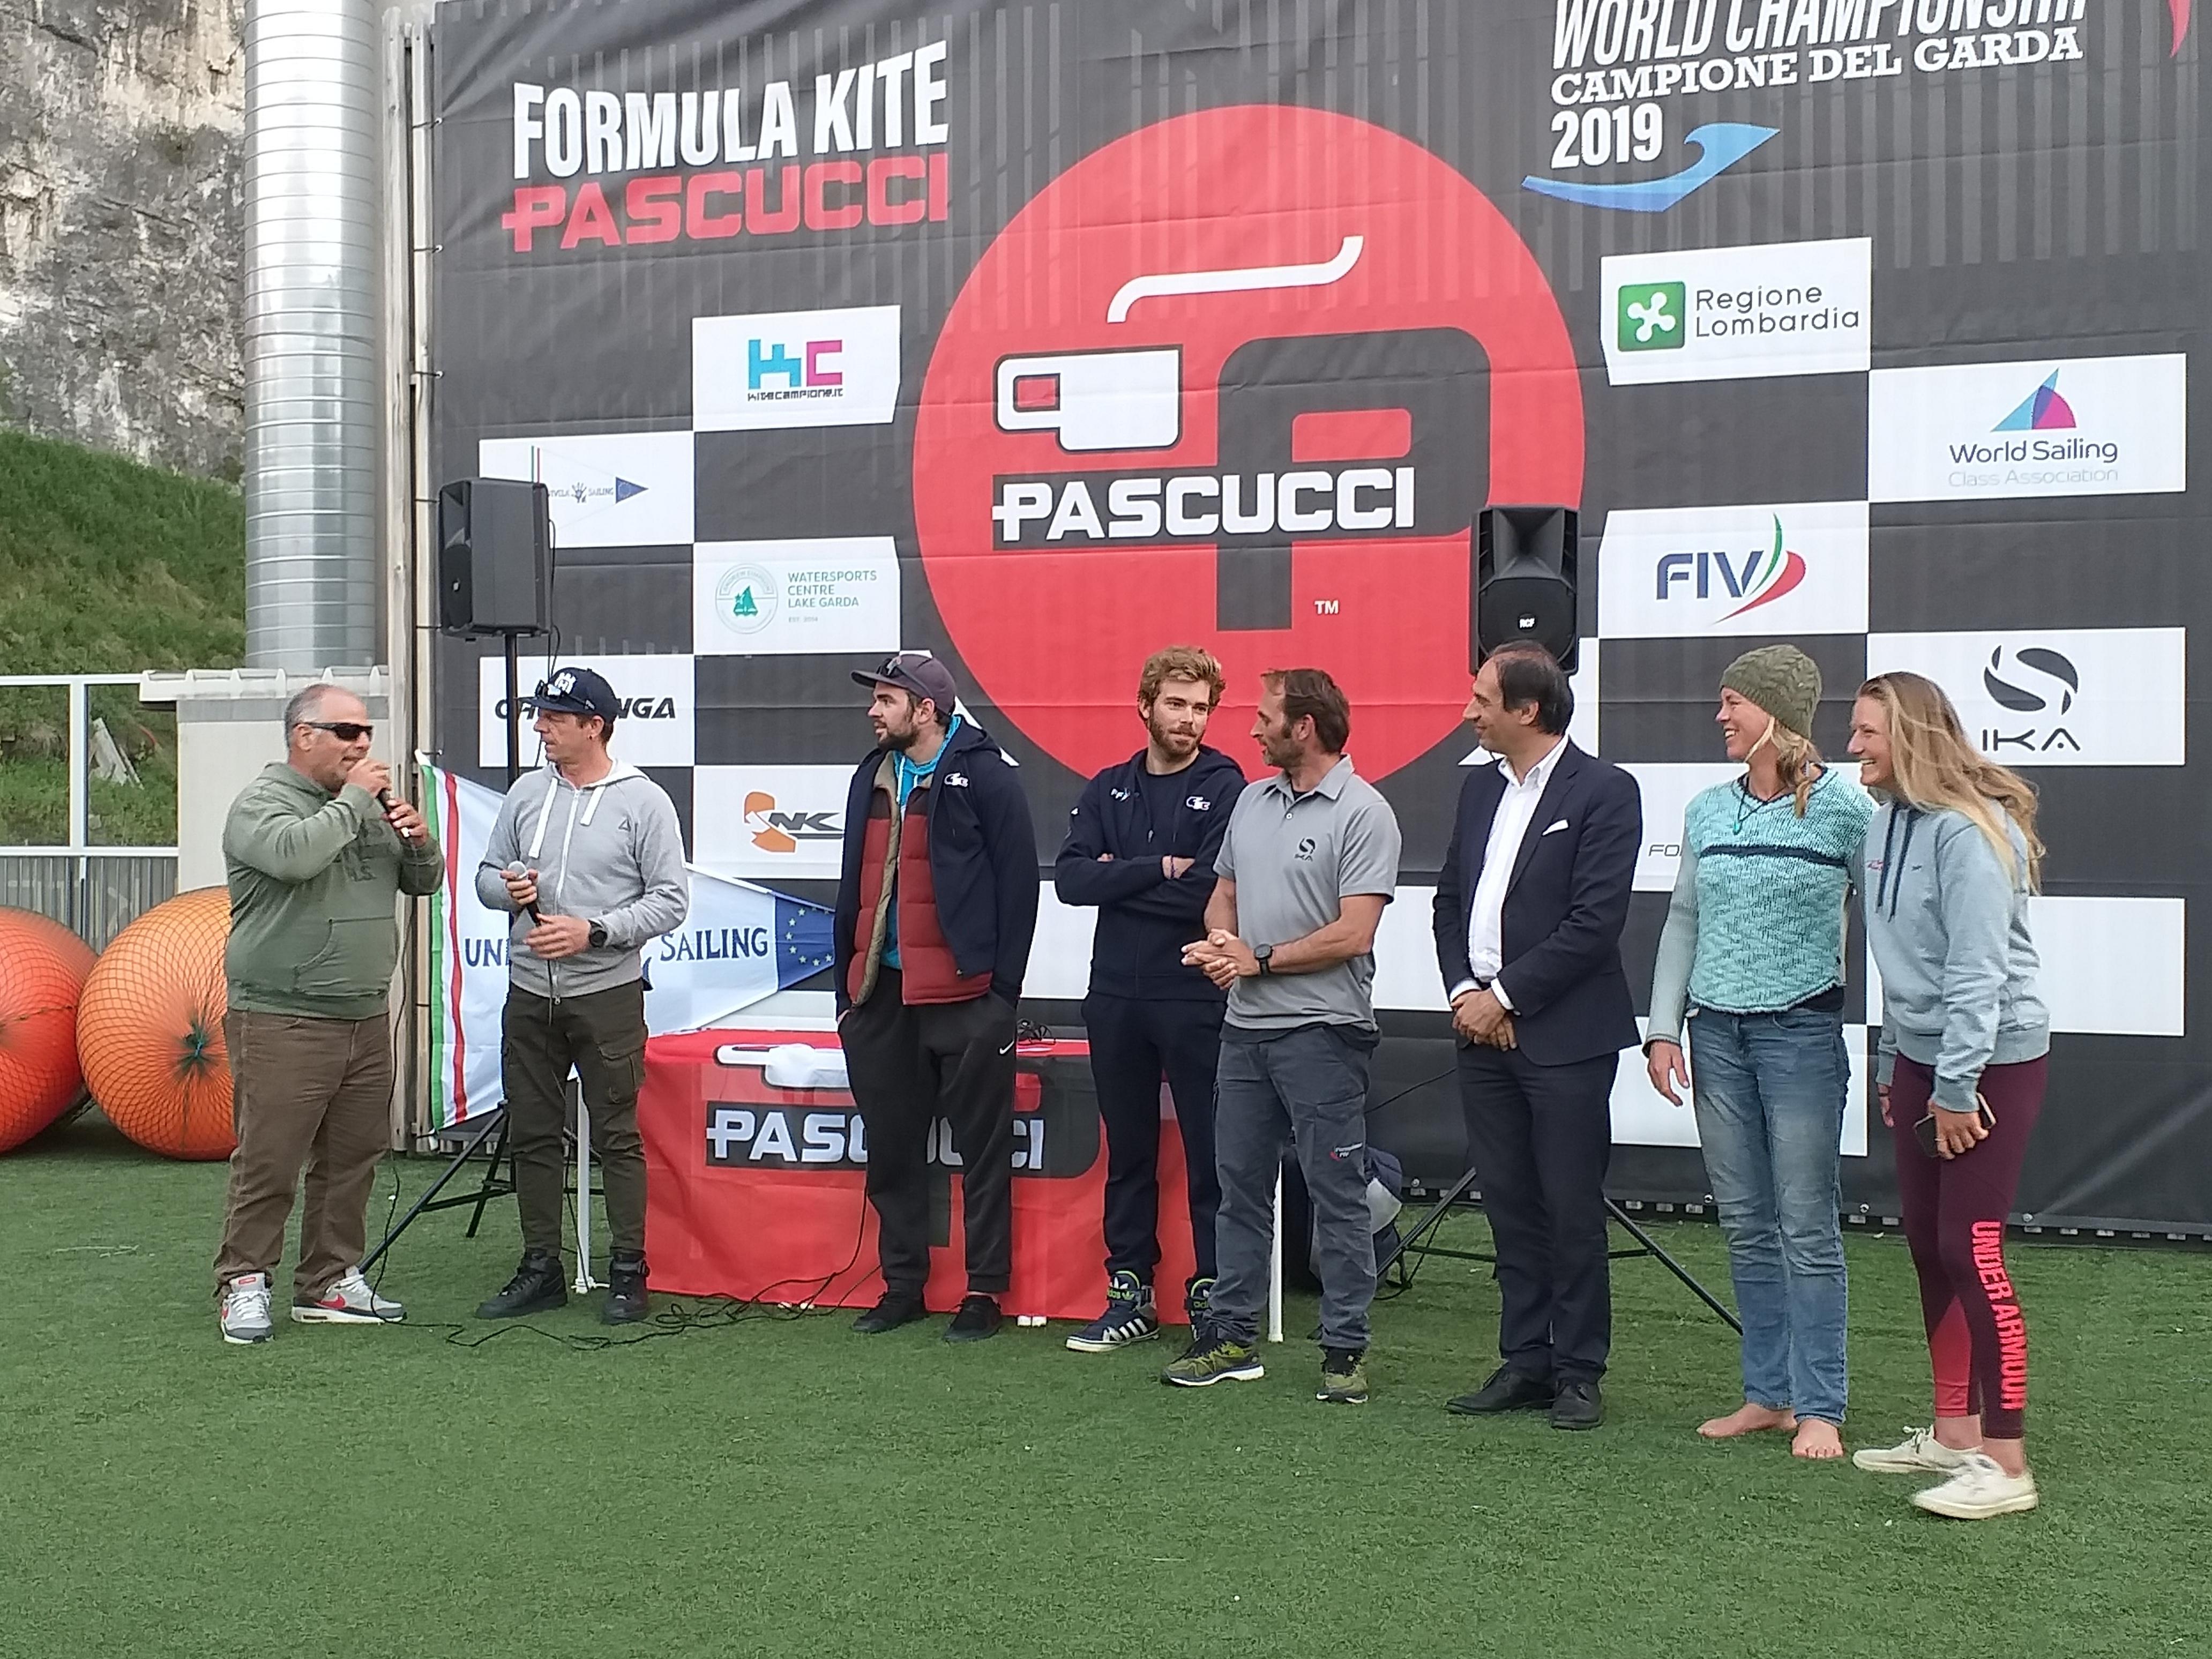 World Championships Campione del Garda, Italy